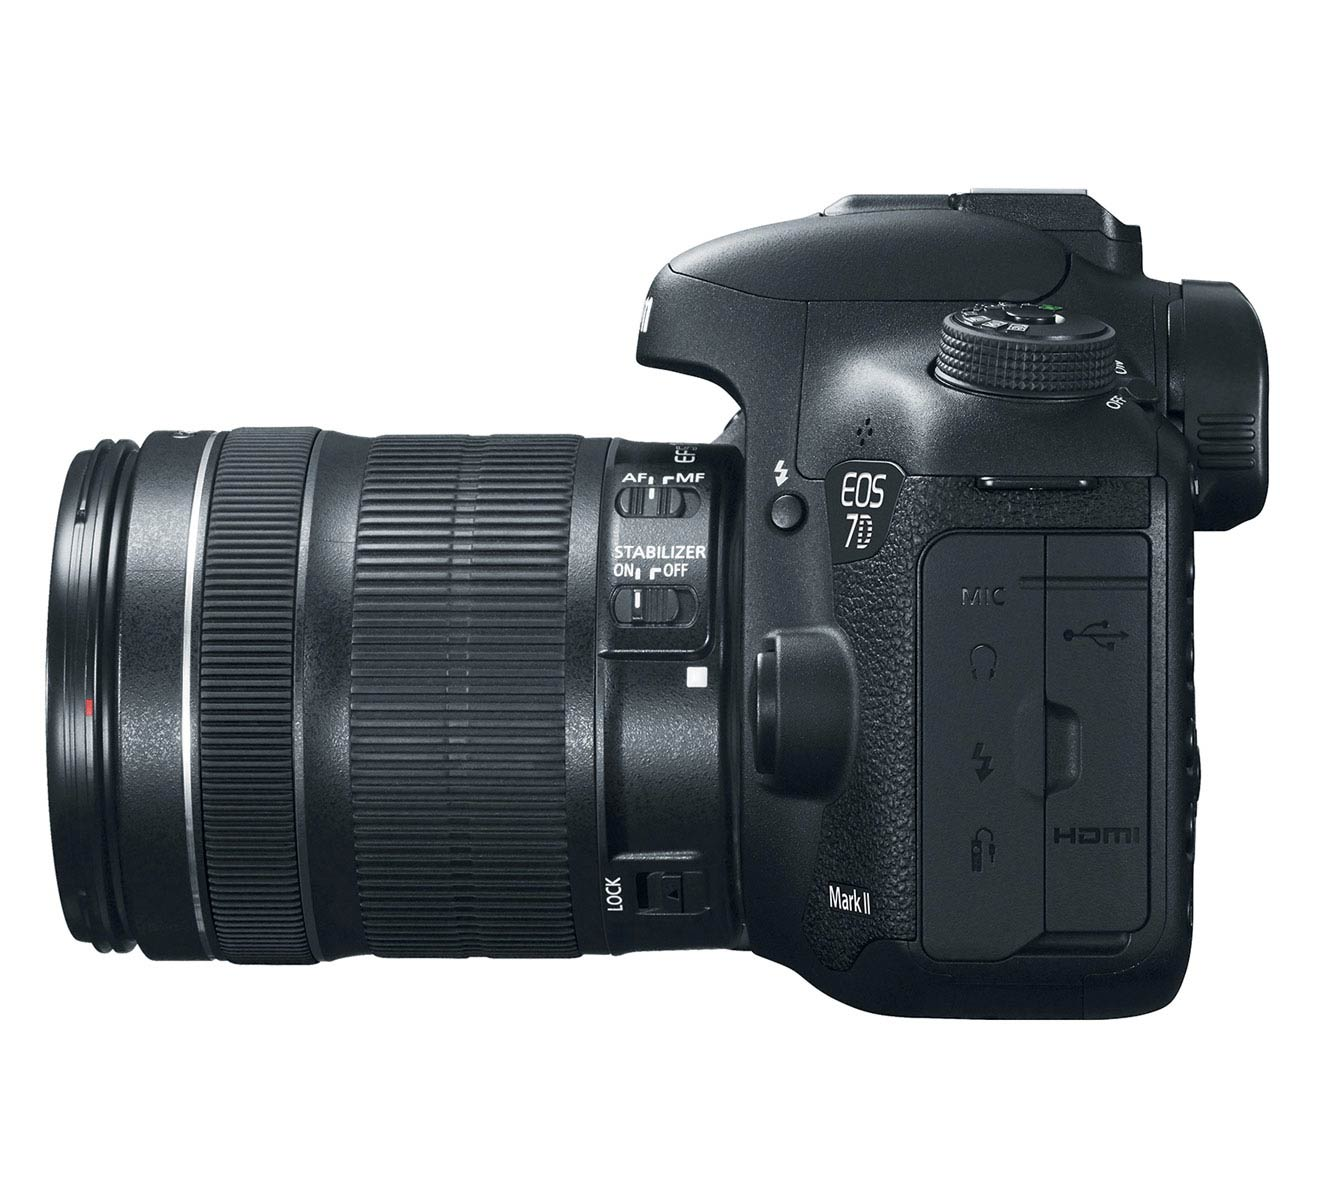 canon announces the eos 7d mark ii 3 new lenses light. Black Bedroom Furniture Sets. Home Design Ideas